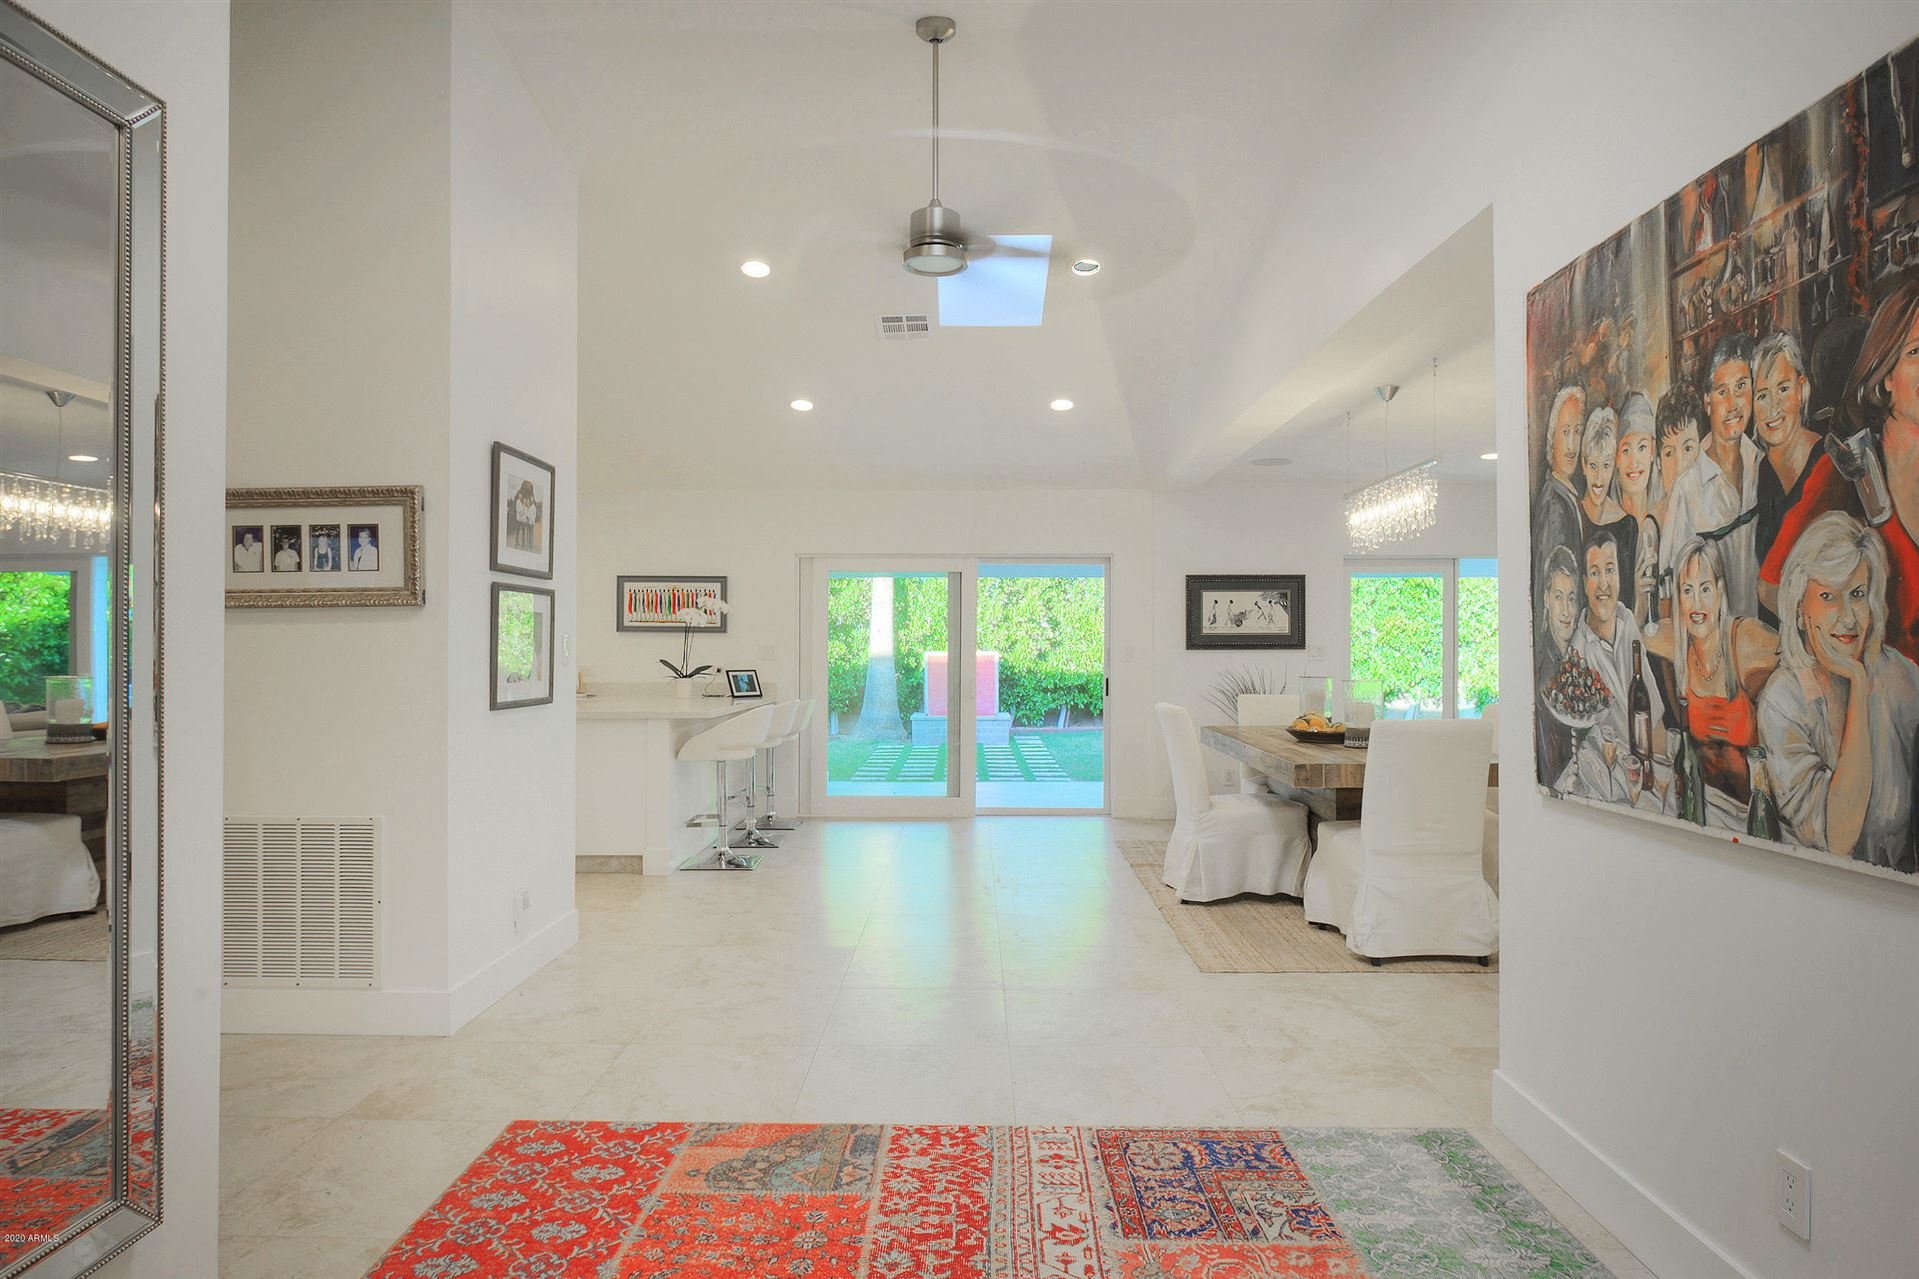 Property Image Of 2539 E Marshall Avenue In Phoenix, Az